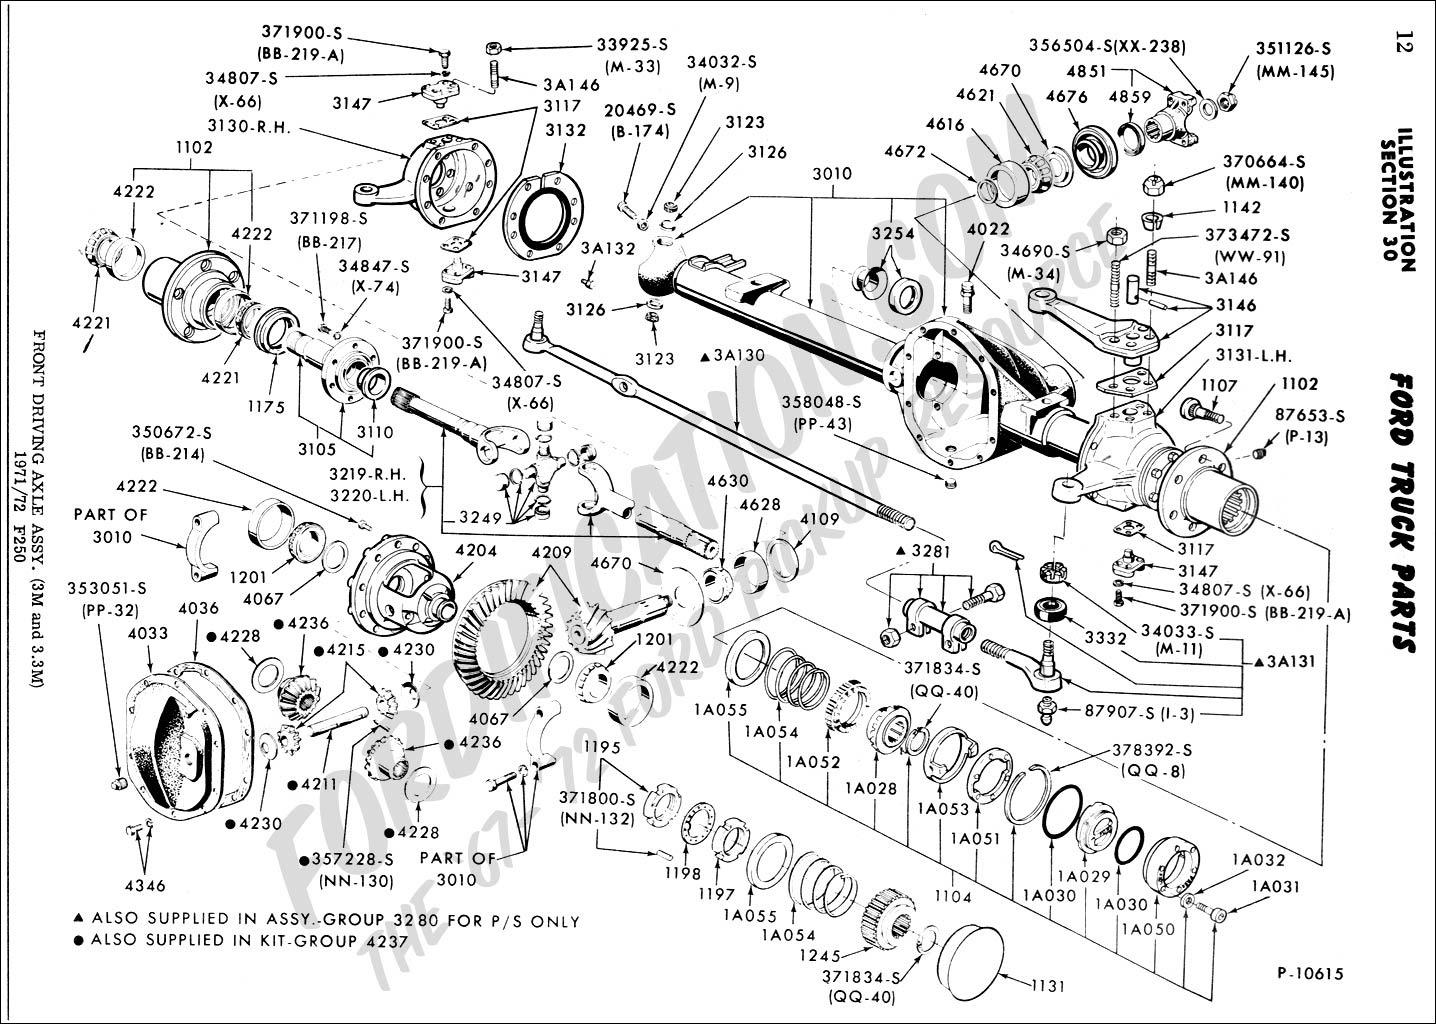 2004 f250 4x4 wiring diagram